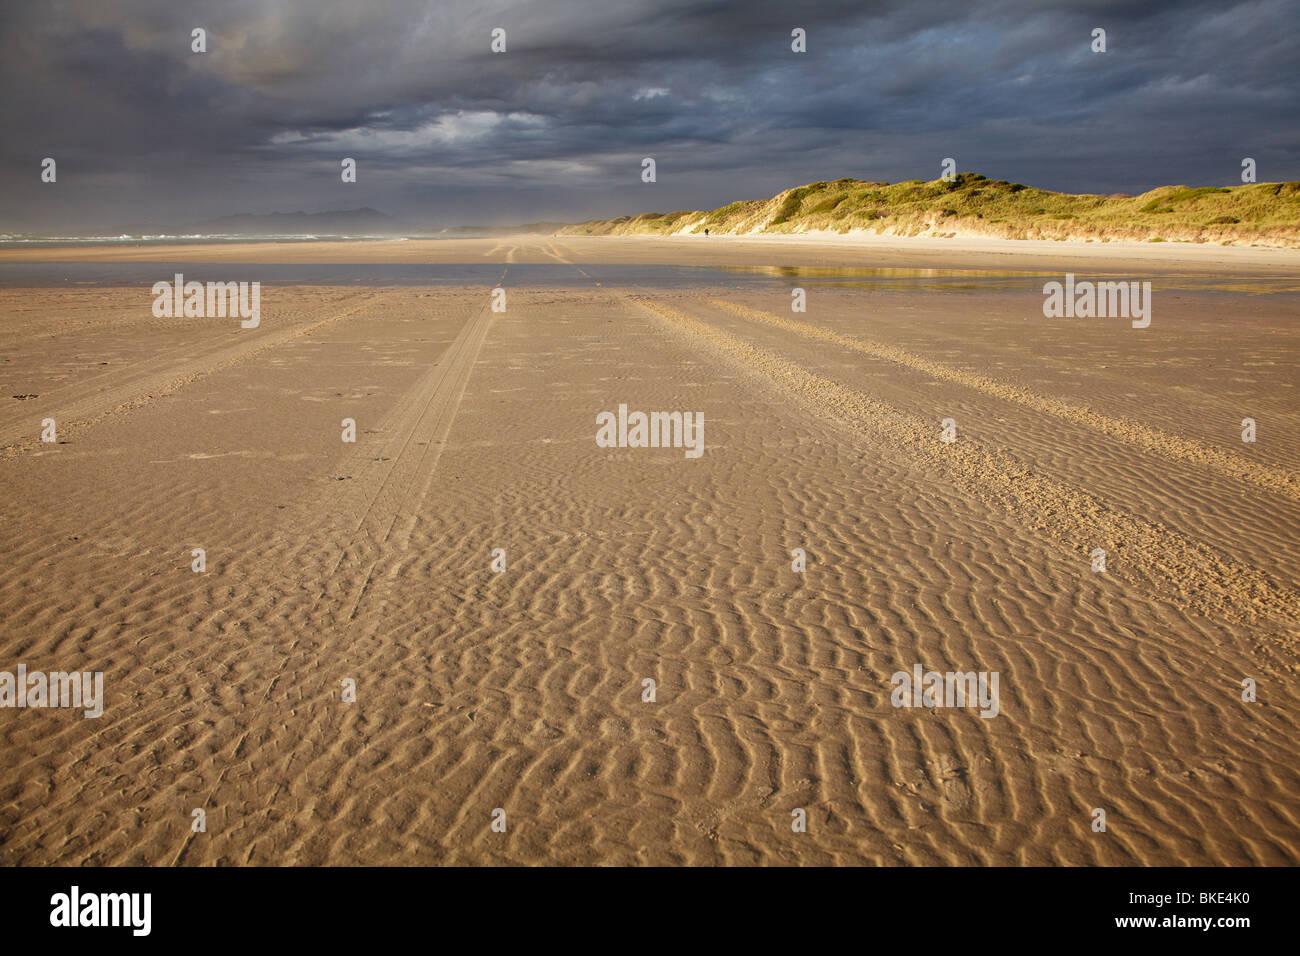 Sand Ripples, Tire Tracks, and Storm Clouds, Ocean Beach, near Strahan, Western Tasmania, Australia - Stock Image